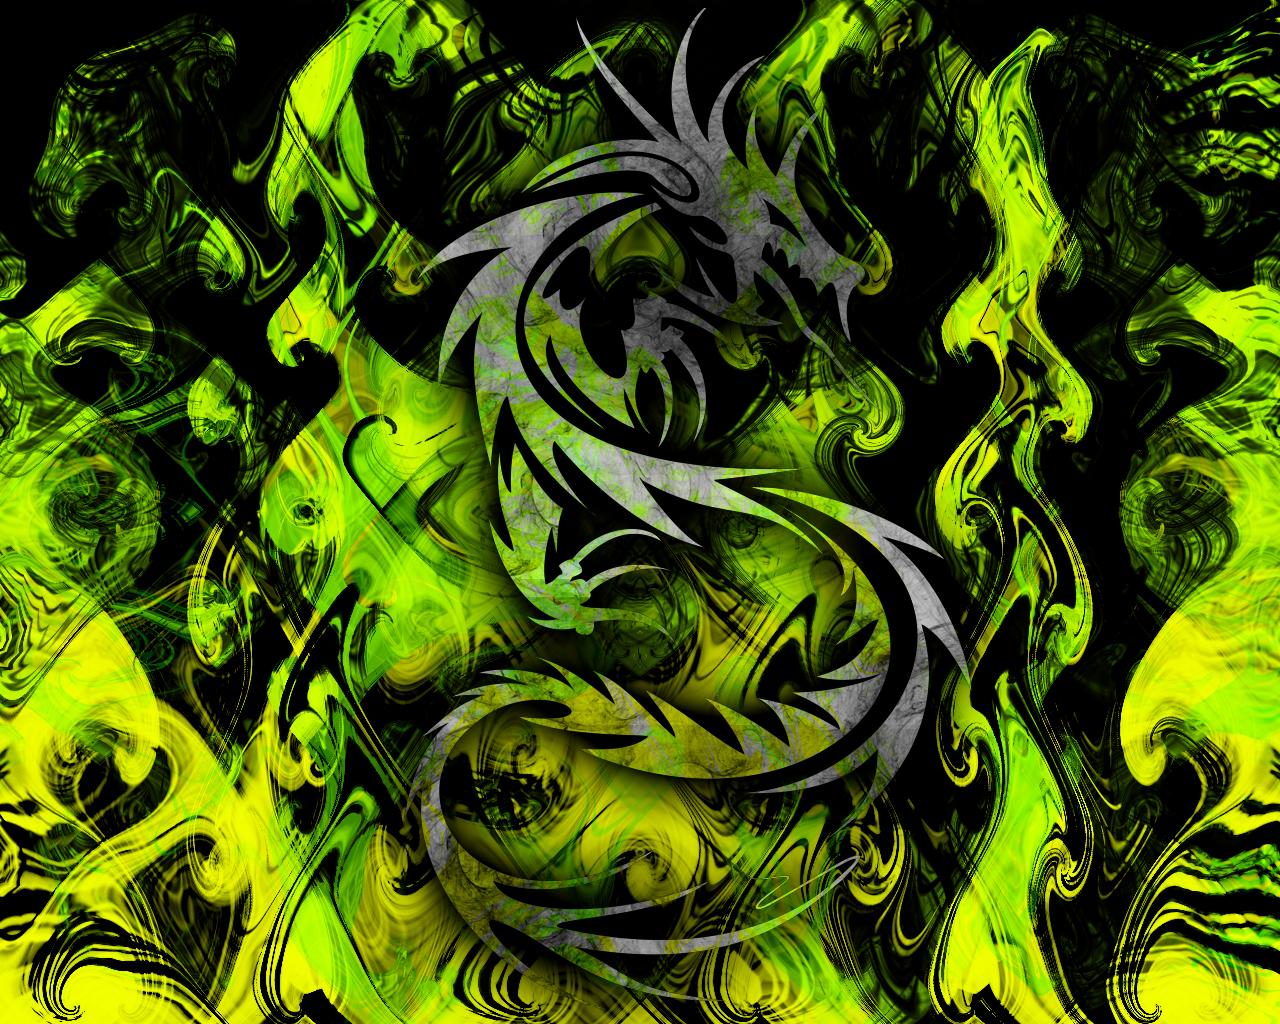 Green Dragon By Manifesto  Desktop Wallpaper